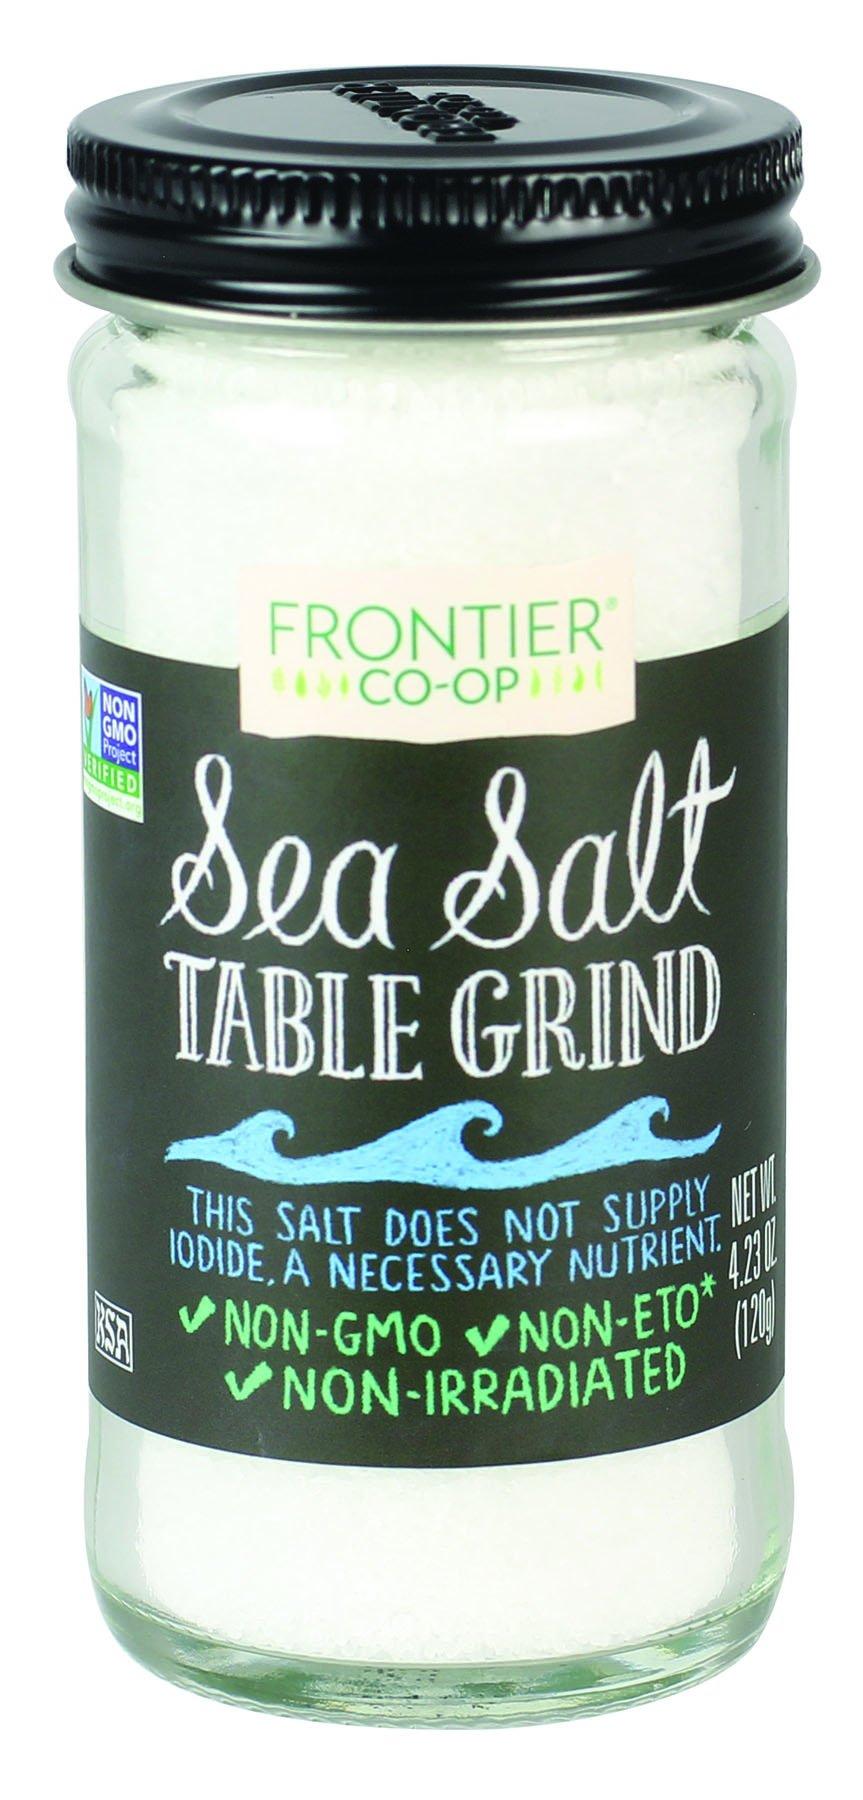 Frontier Co-op Table Grind Sea Salt, 4.23 Ounce (Pack of 12)